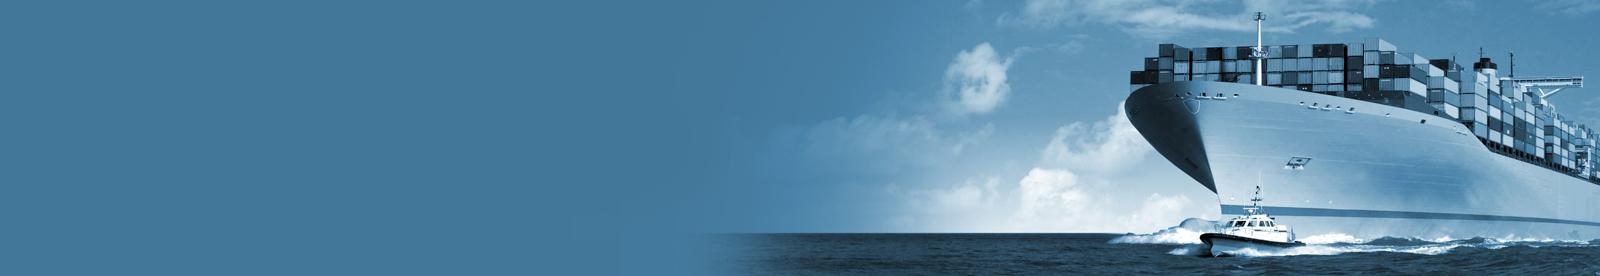 fret-maritime